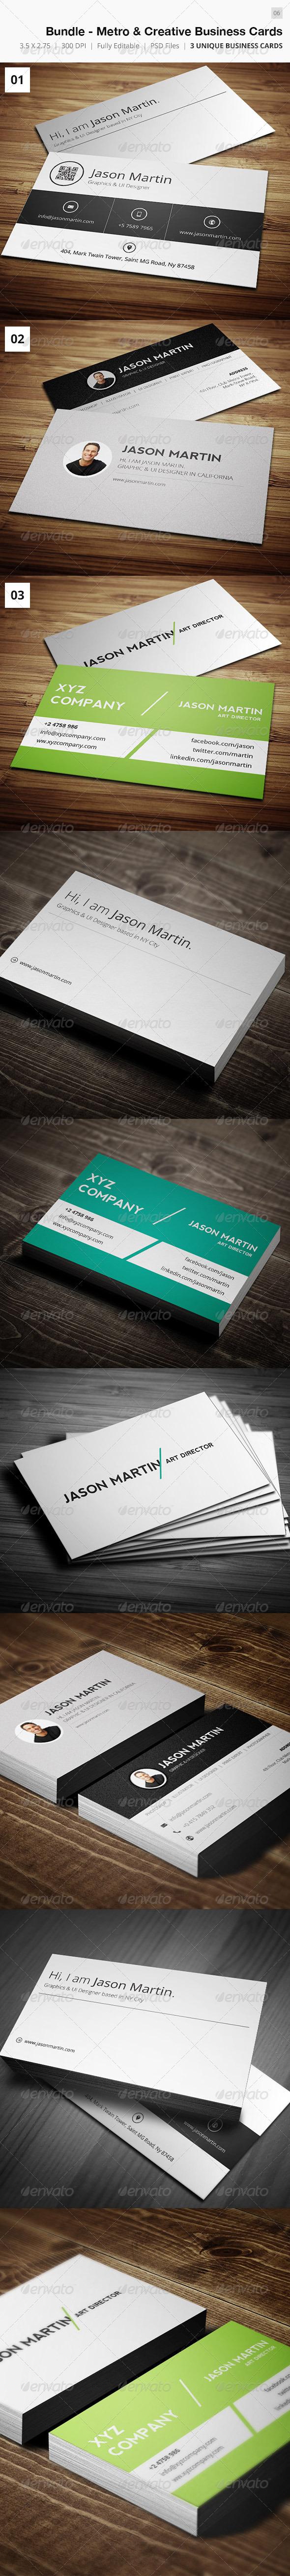 Bundle - Metro & Creative Business Cards 06 - Creative Business Cards